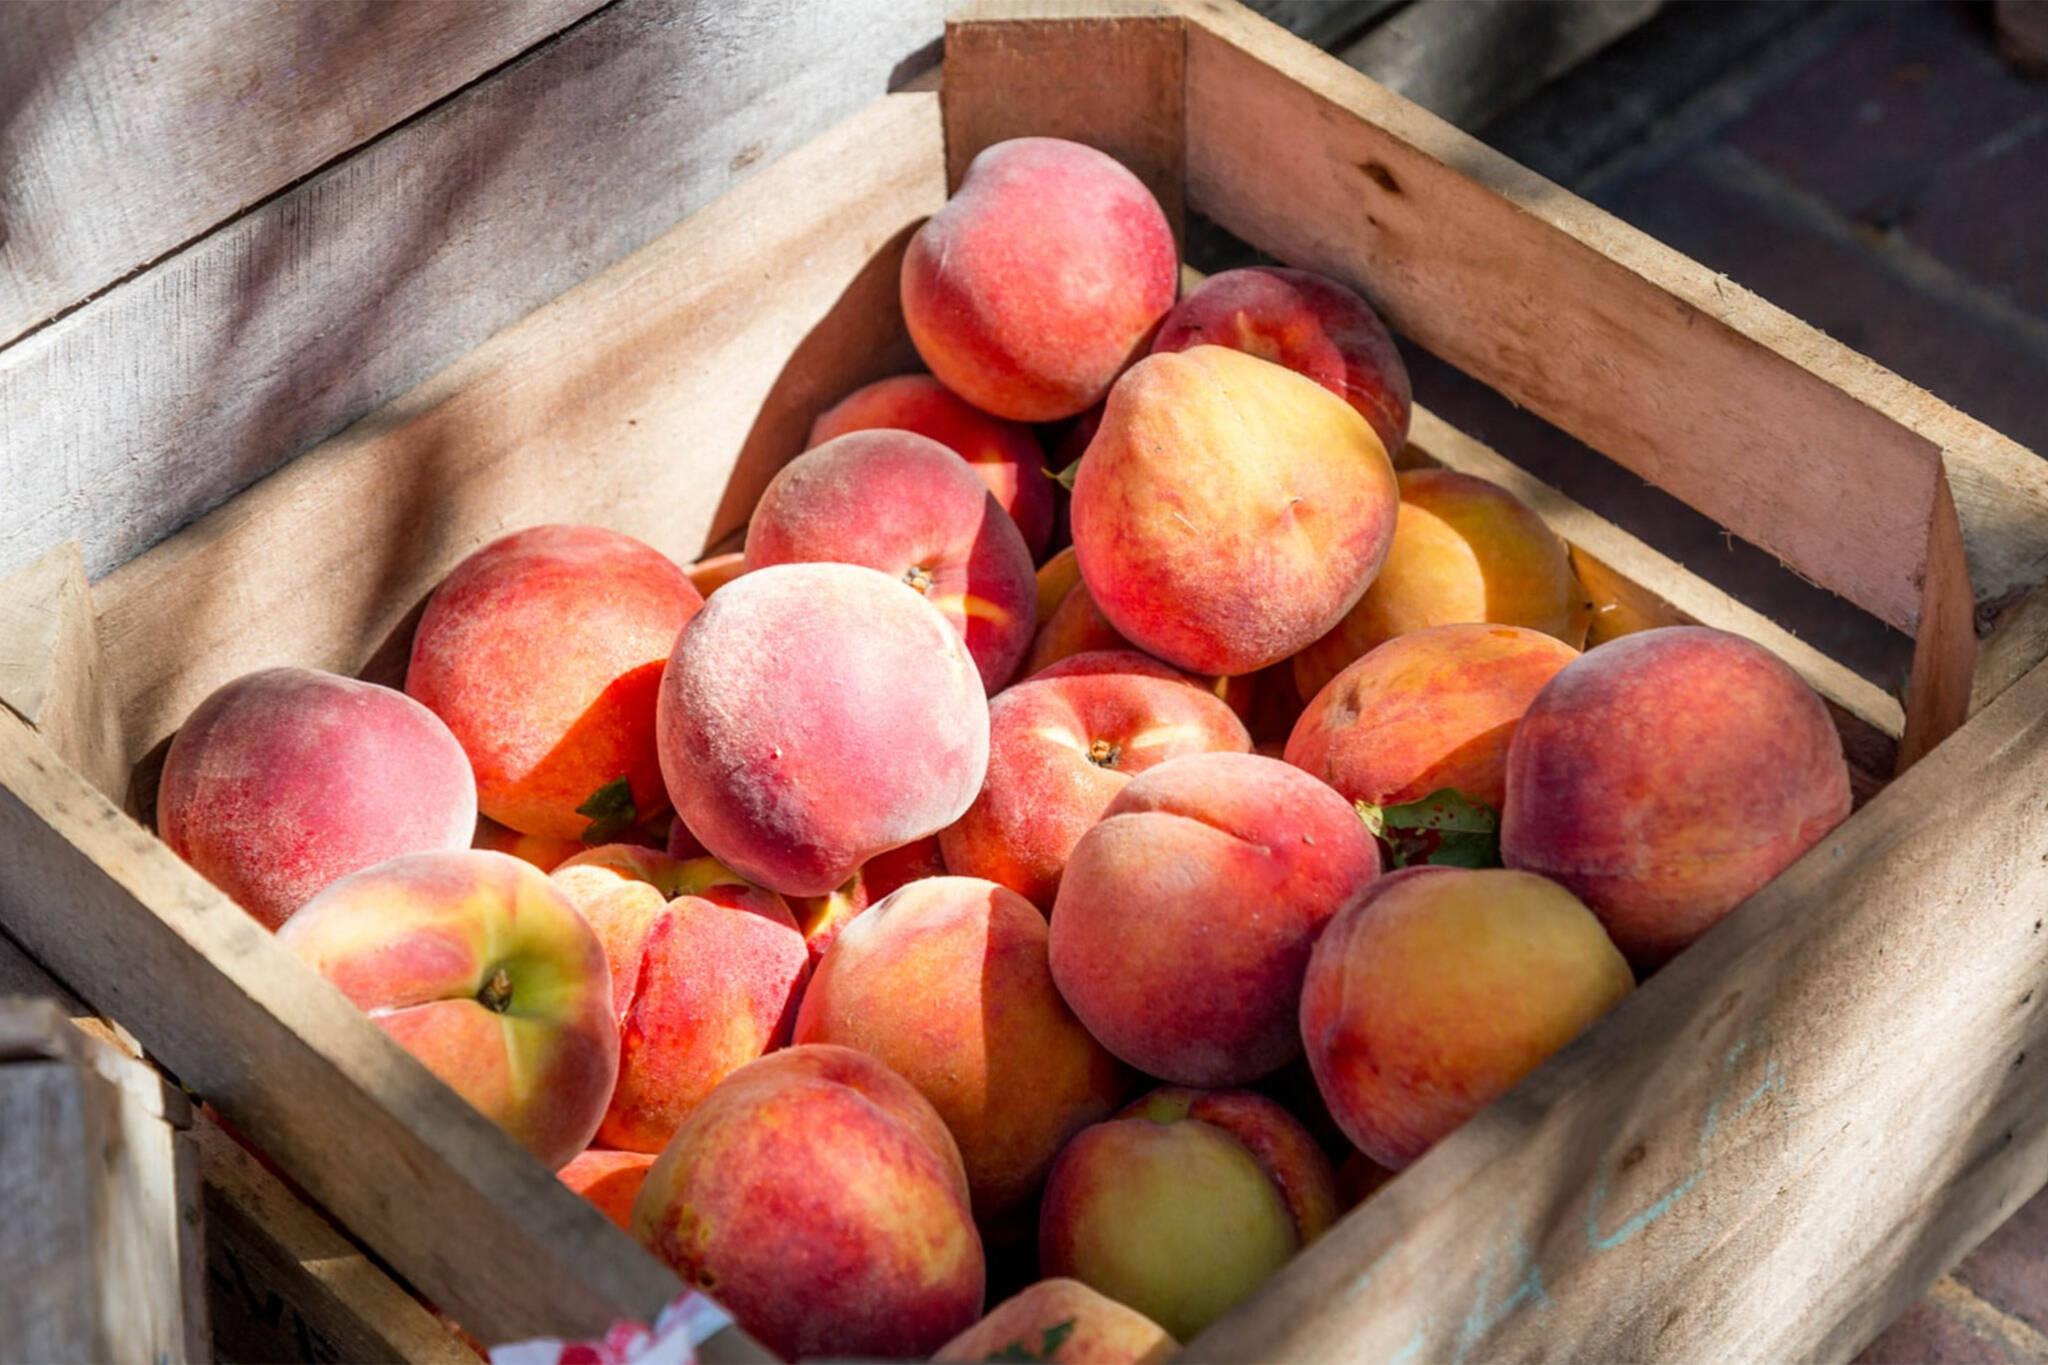 peaches ontario